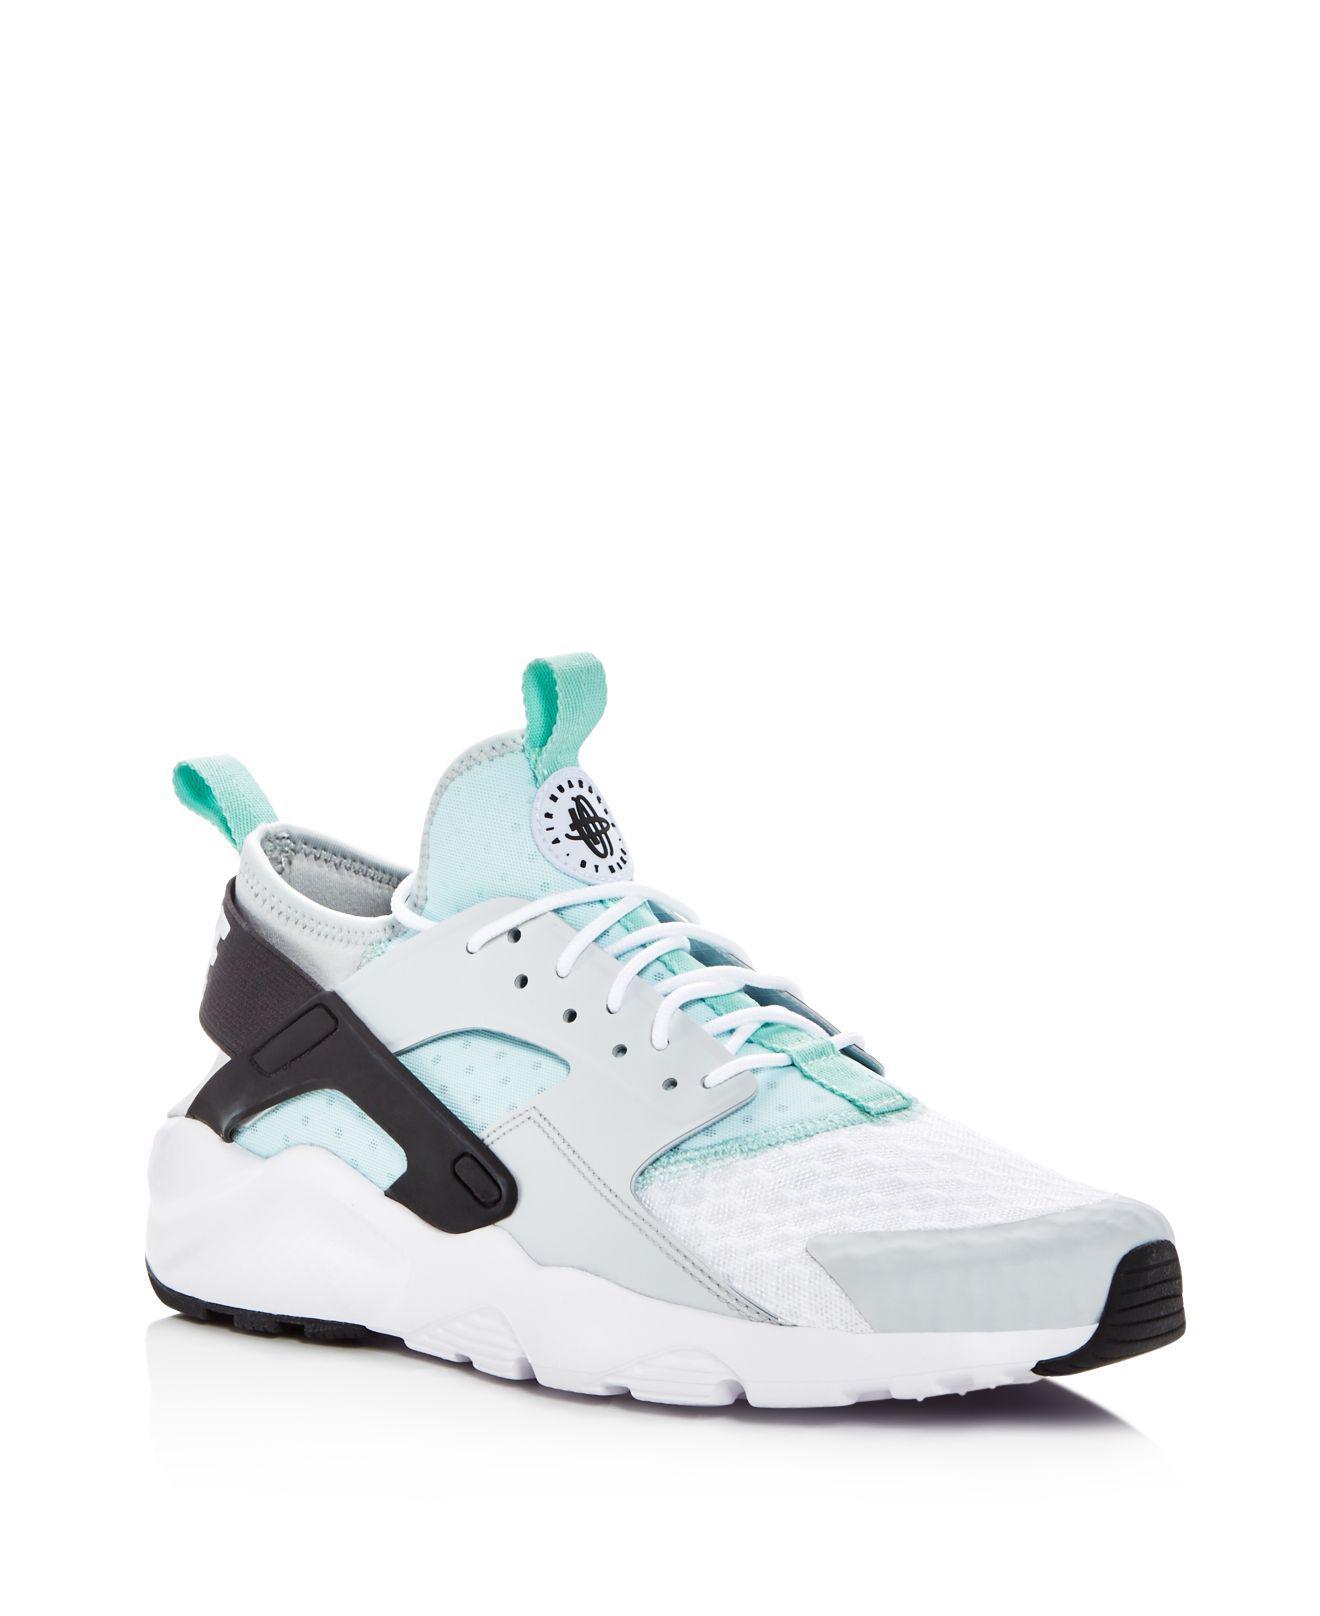 Nike Men's Air Huarache Run Ultra Lace Up Sneakers W18DIugT